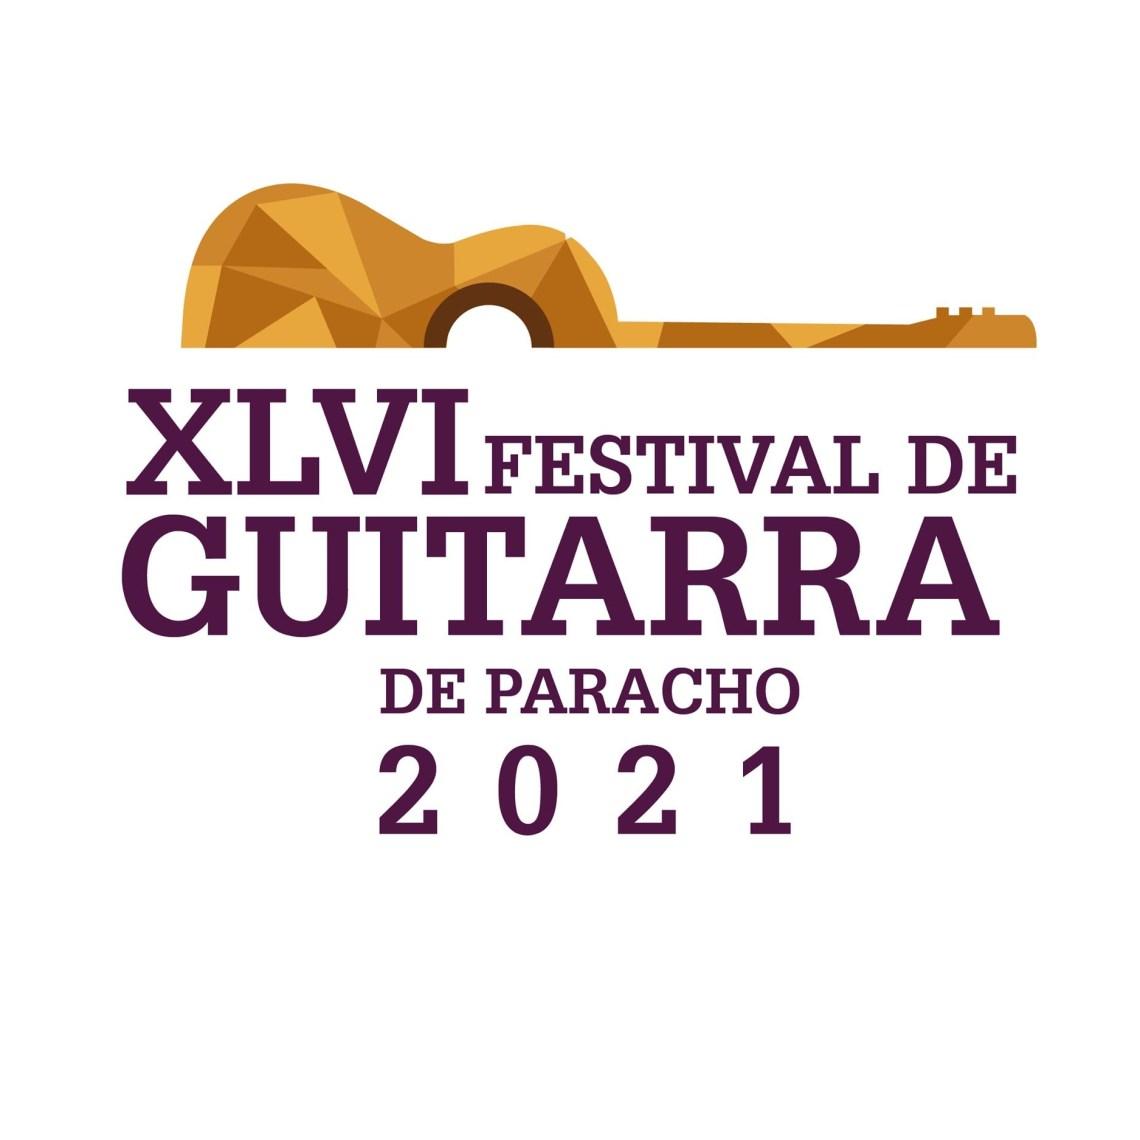 festival de guitarra paracho 2021